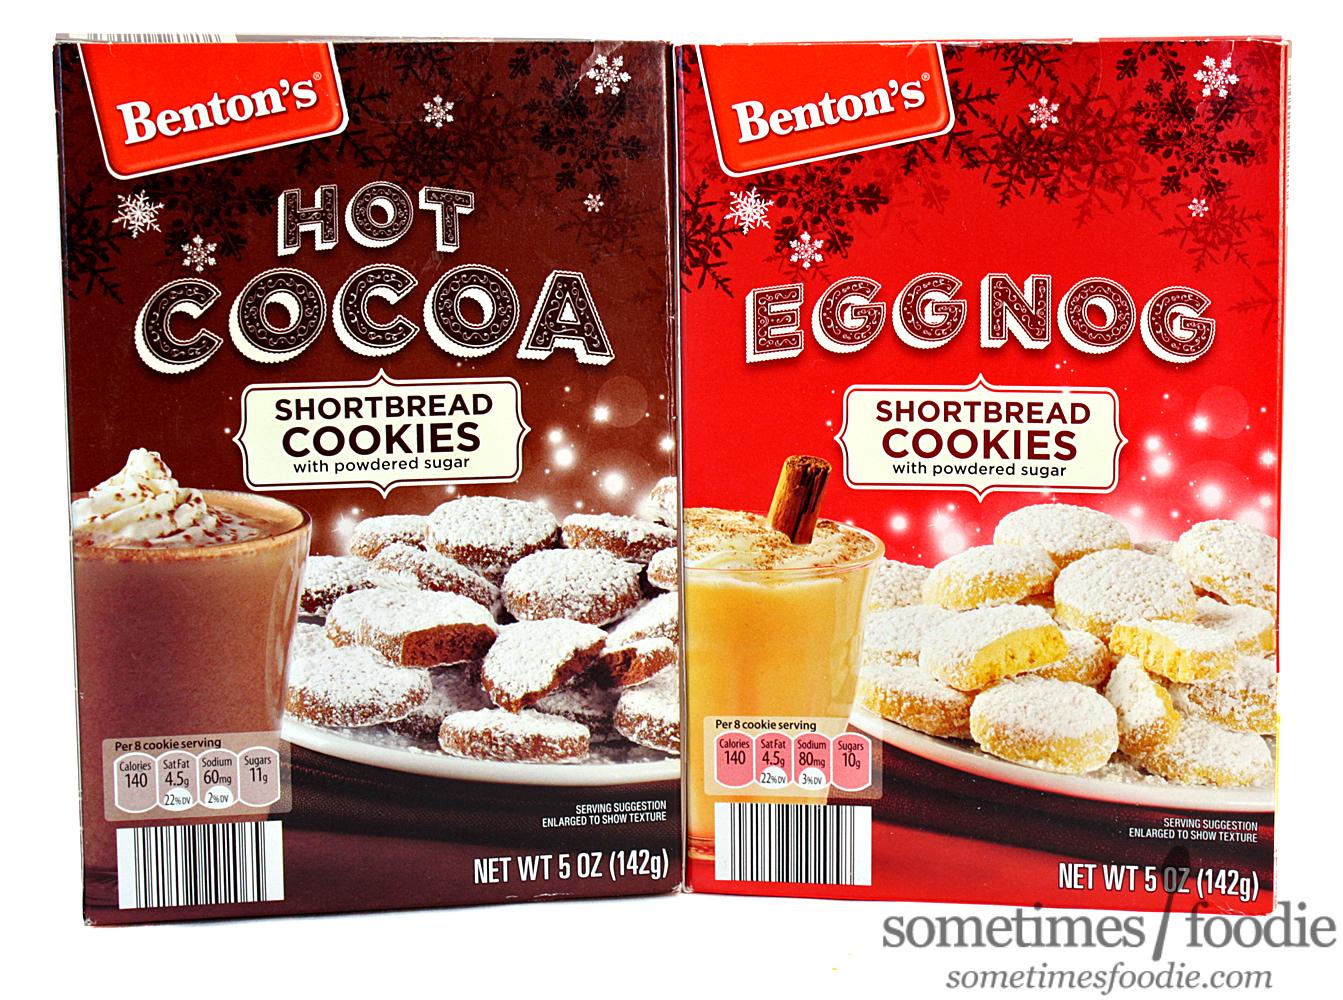 Sometimes Foodie Christmas In July Tbt Benton S Egg Nog Hot